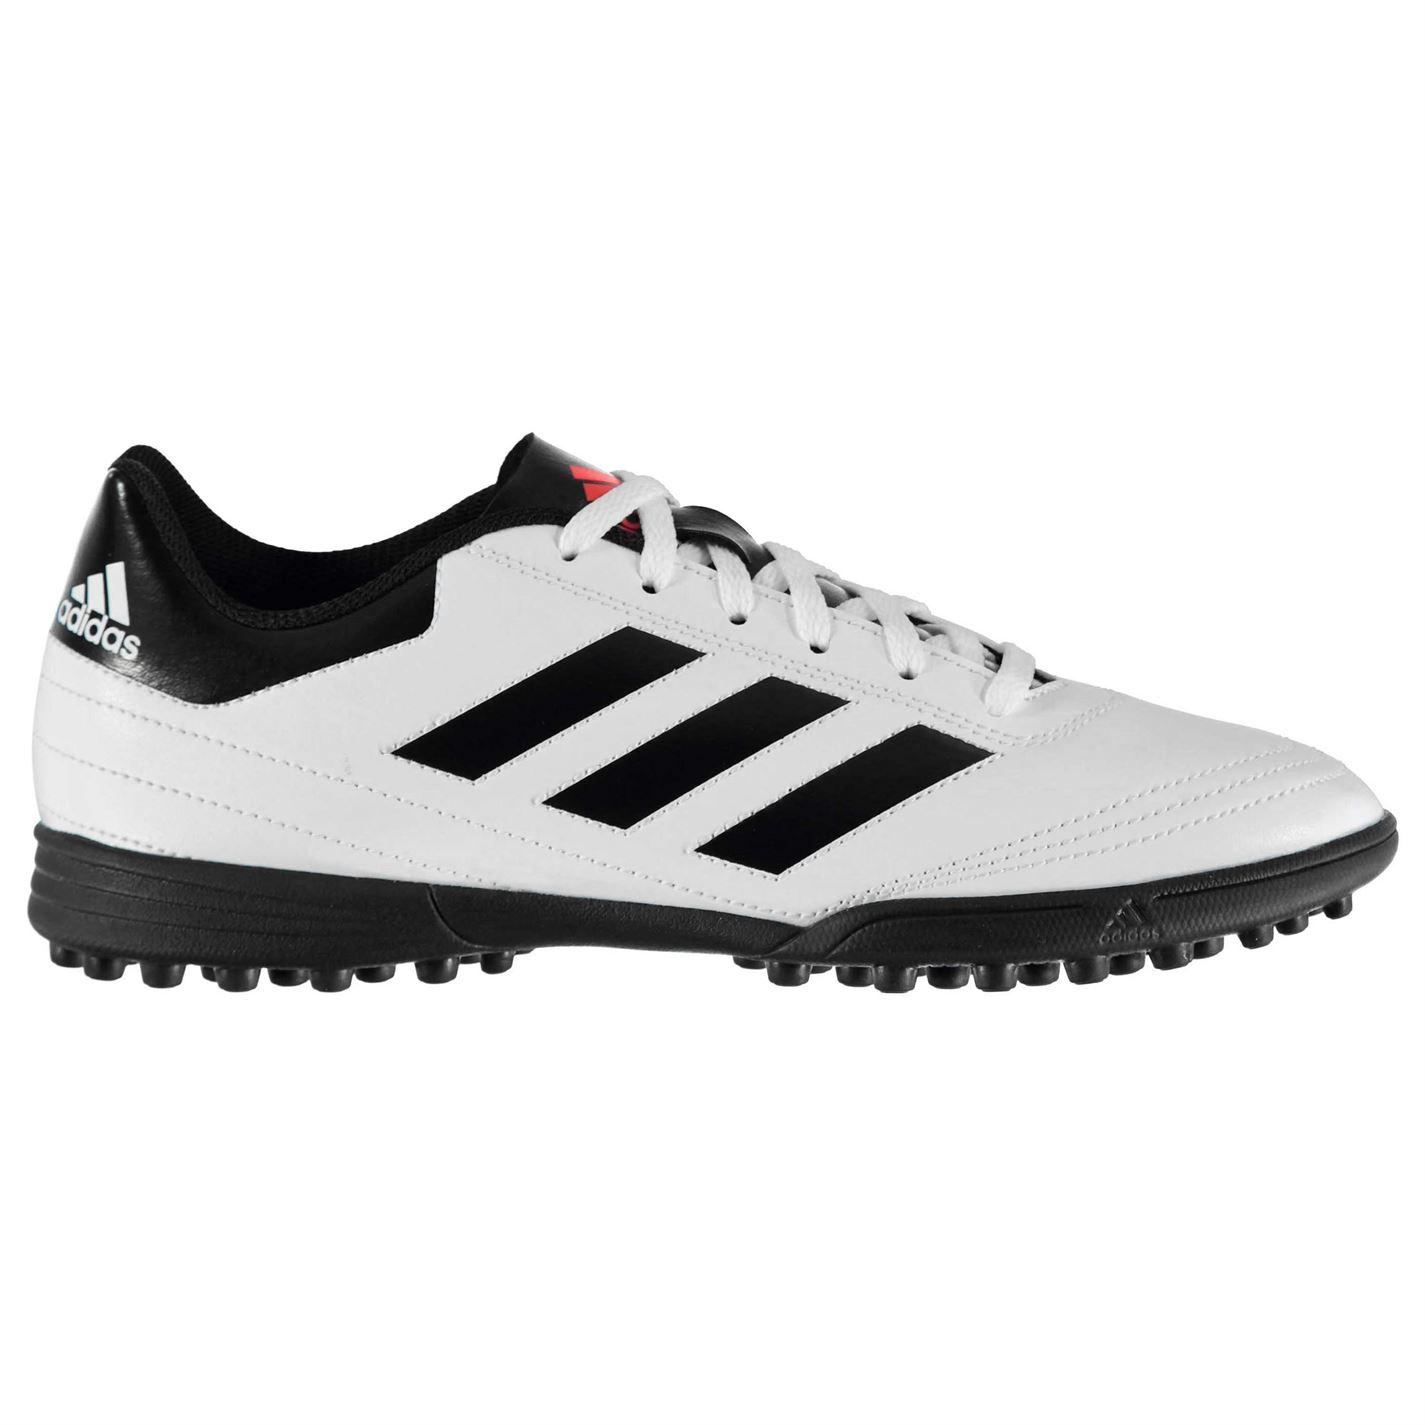 kopačky adidas Goletto TF pánské